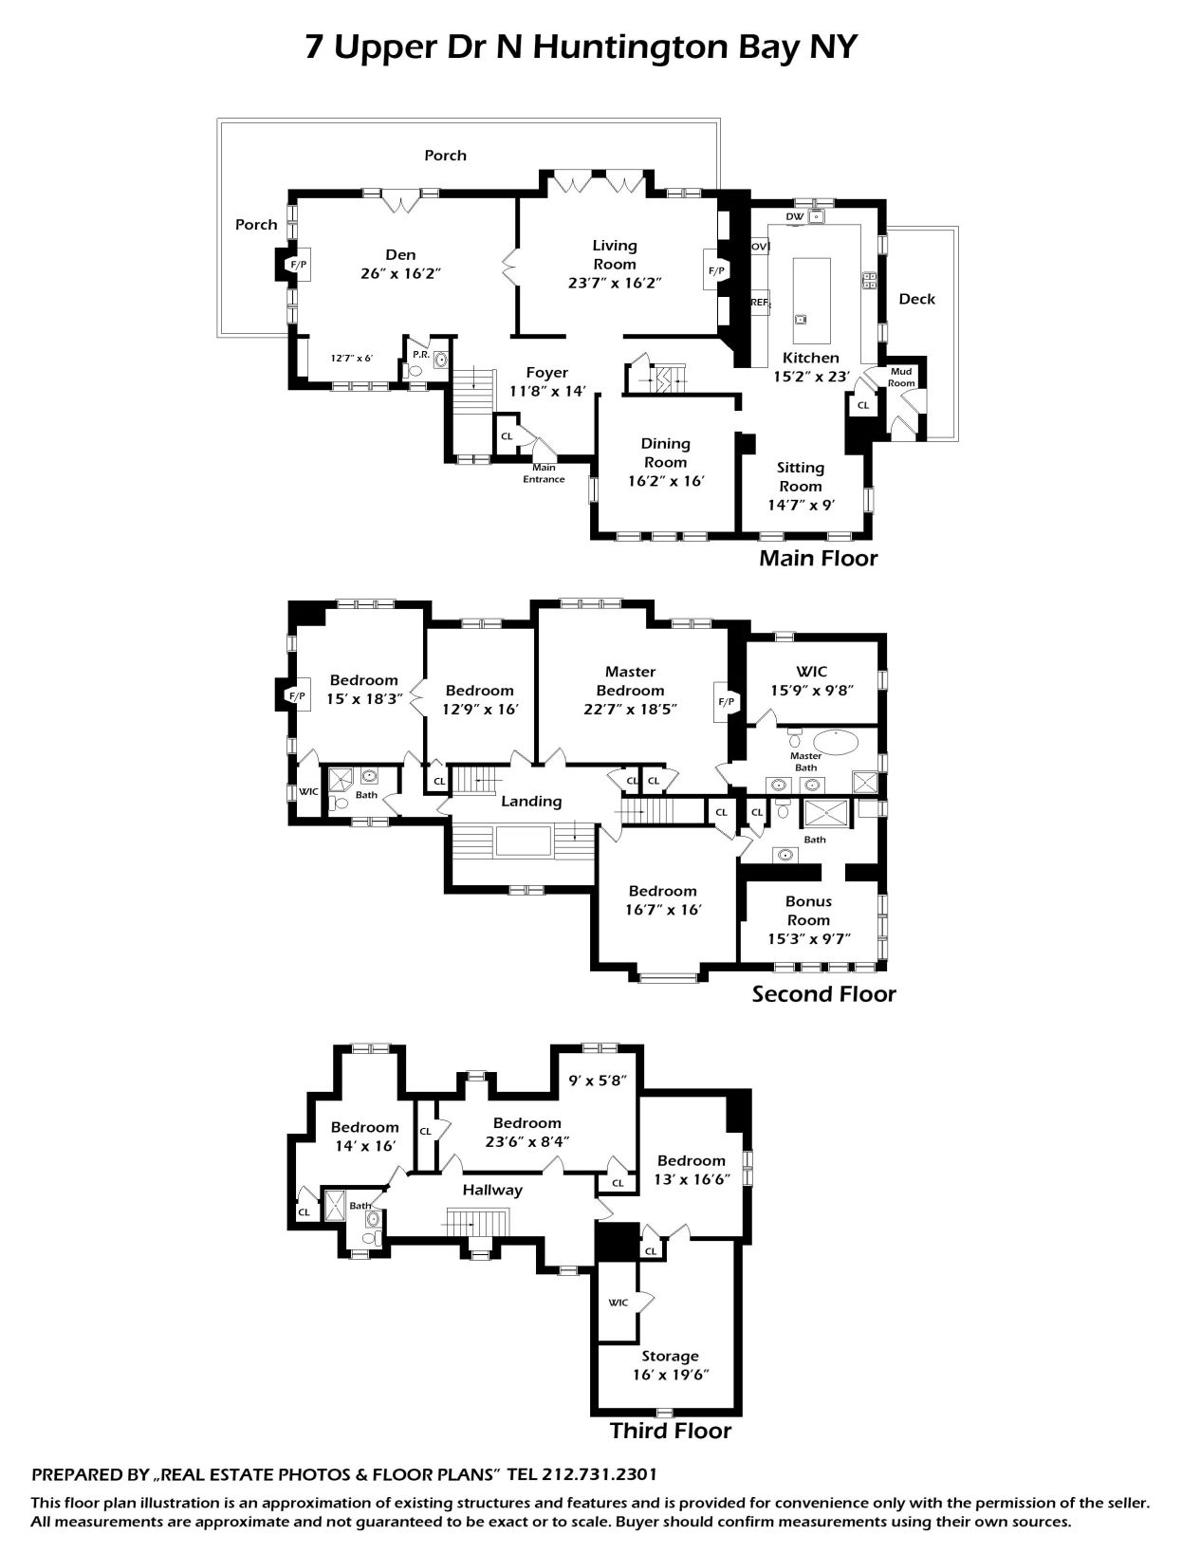 062_Floor Plan.jpg